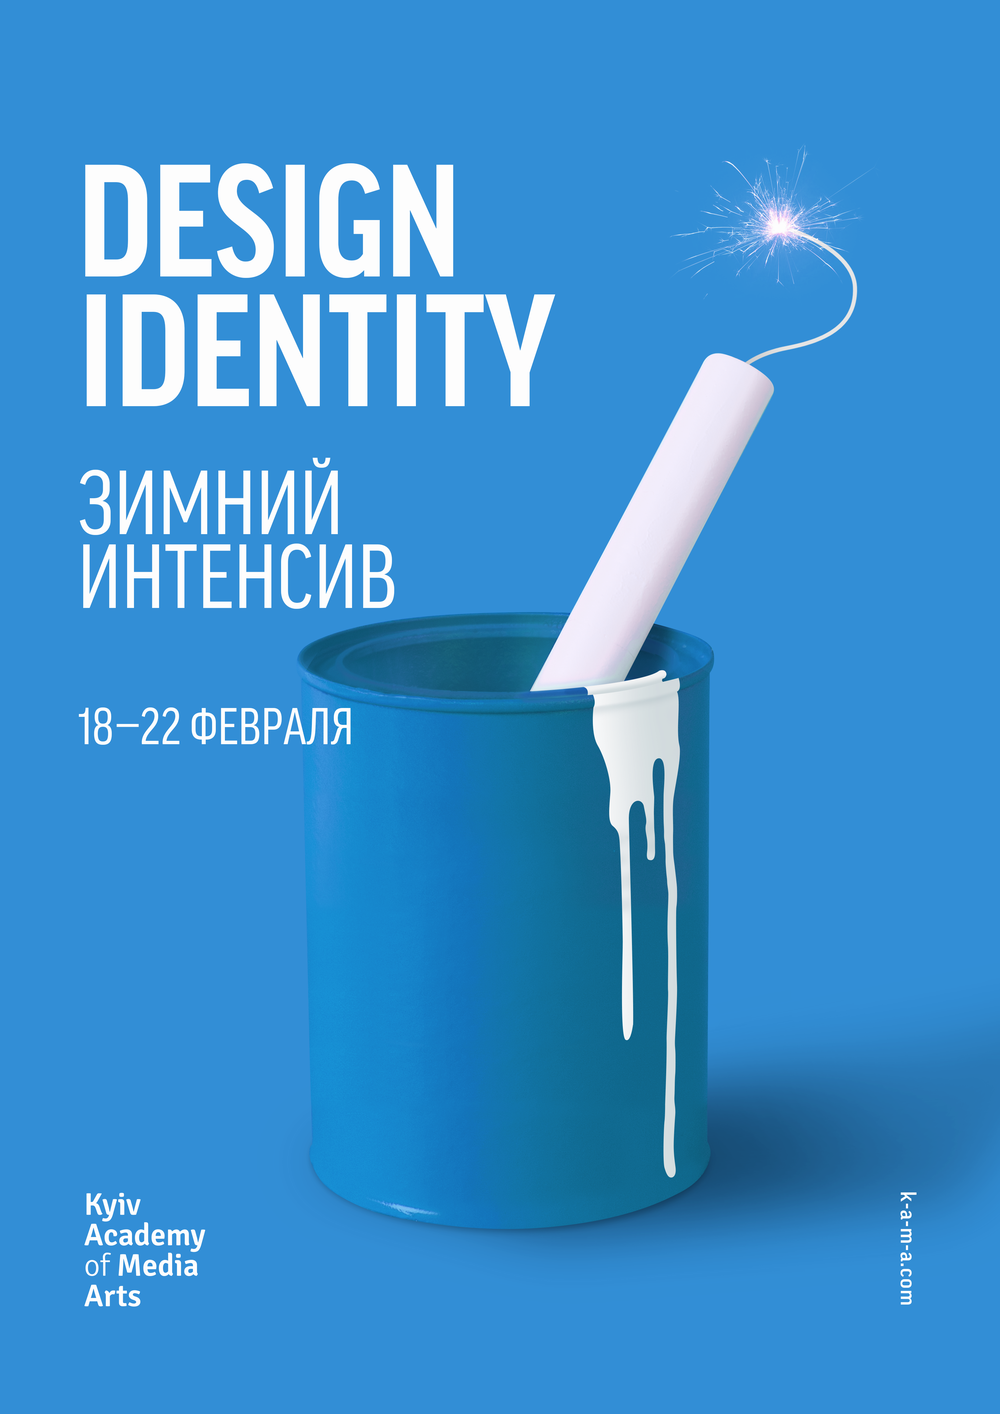 branding19_poster (1).png